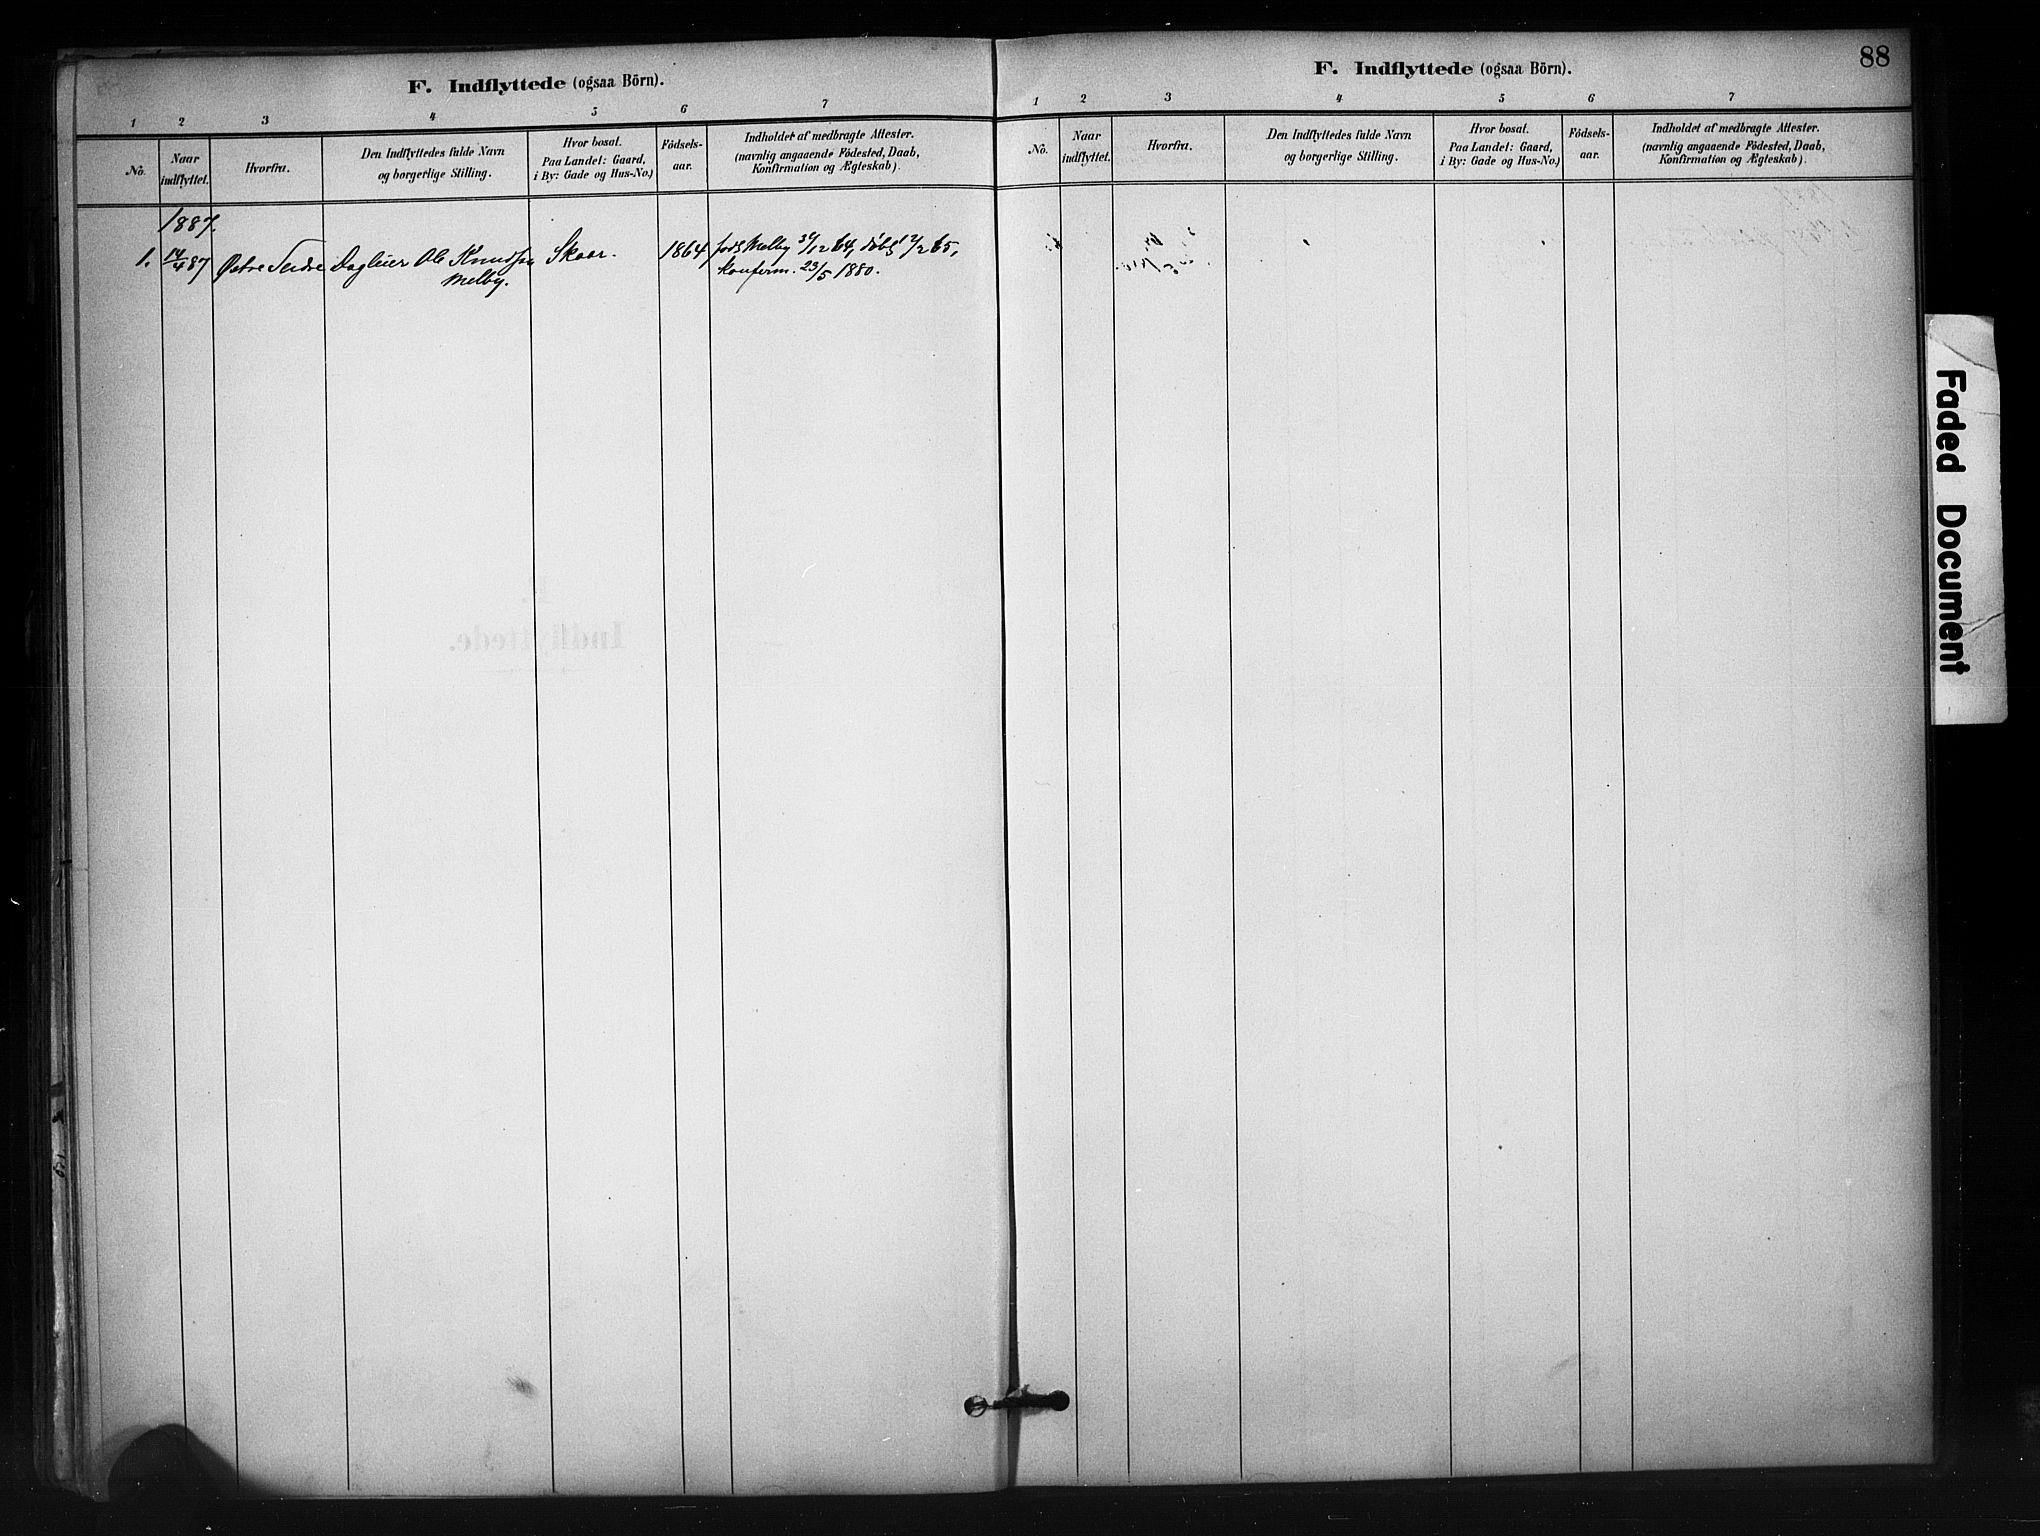 SAH, Nord-Aurdal prestekontor, Ministerialbok nr. 12, 1883-1895, s. 88